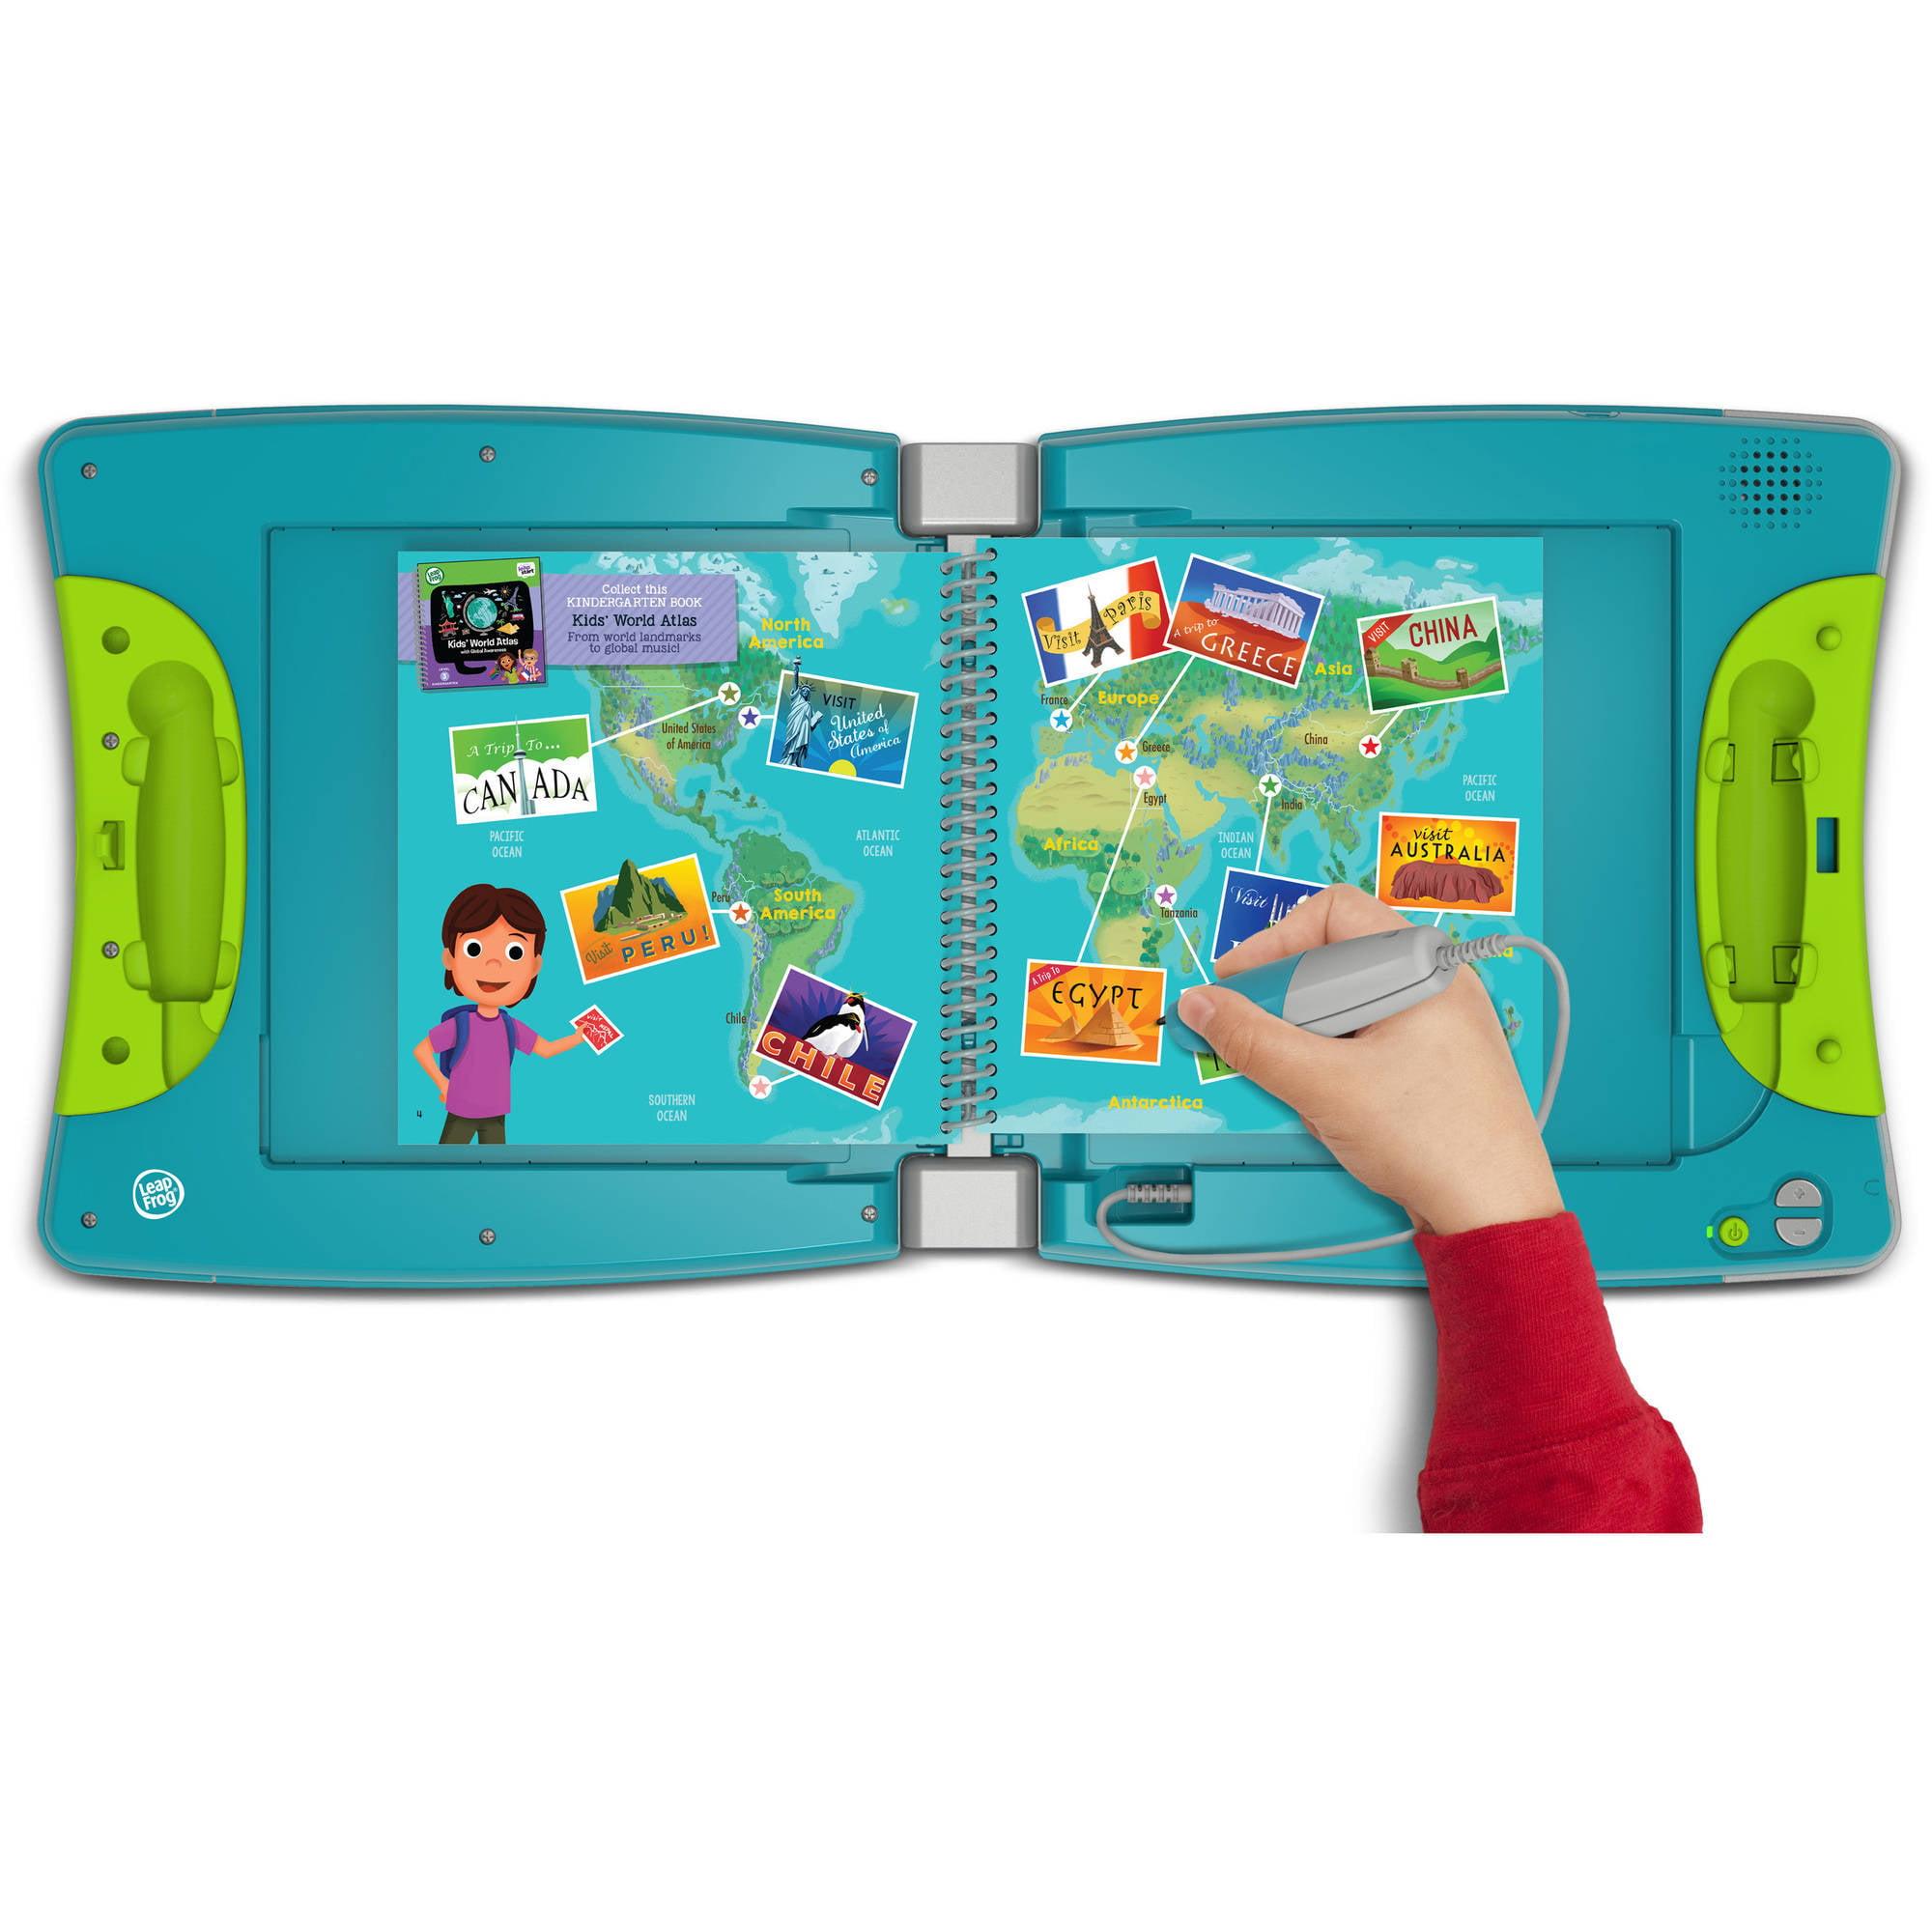 LeapFrog LeapStart Interactive Learning System Kindergarten and 1st Grade for Kids Ages 5-7, ...